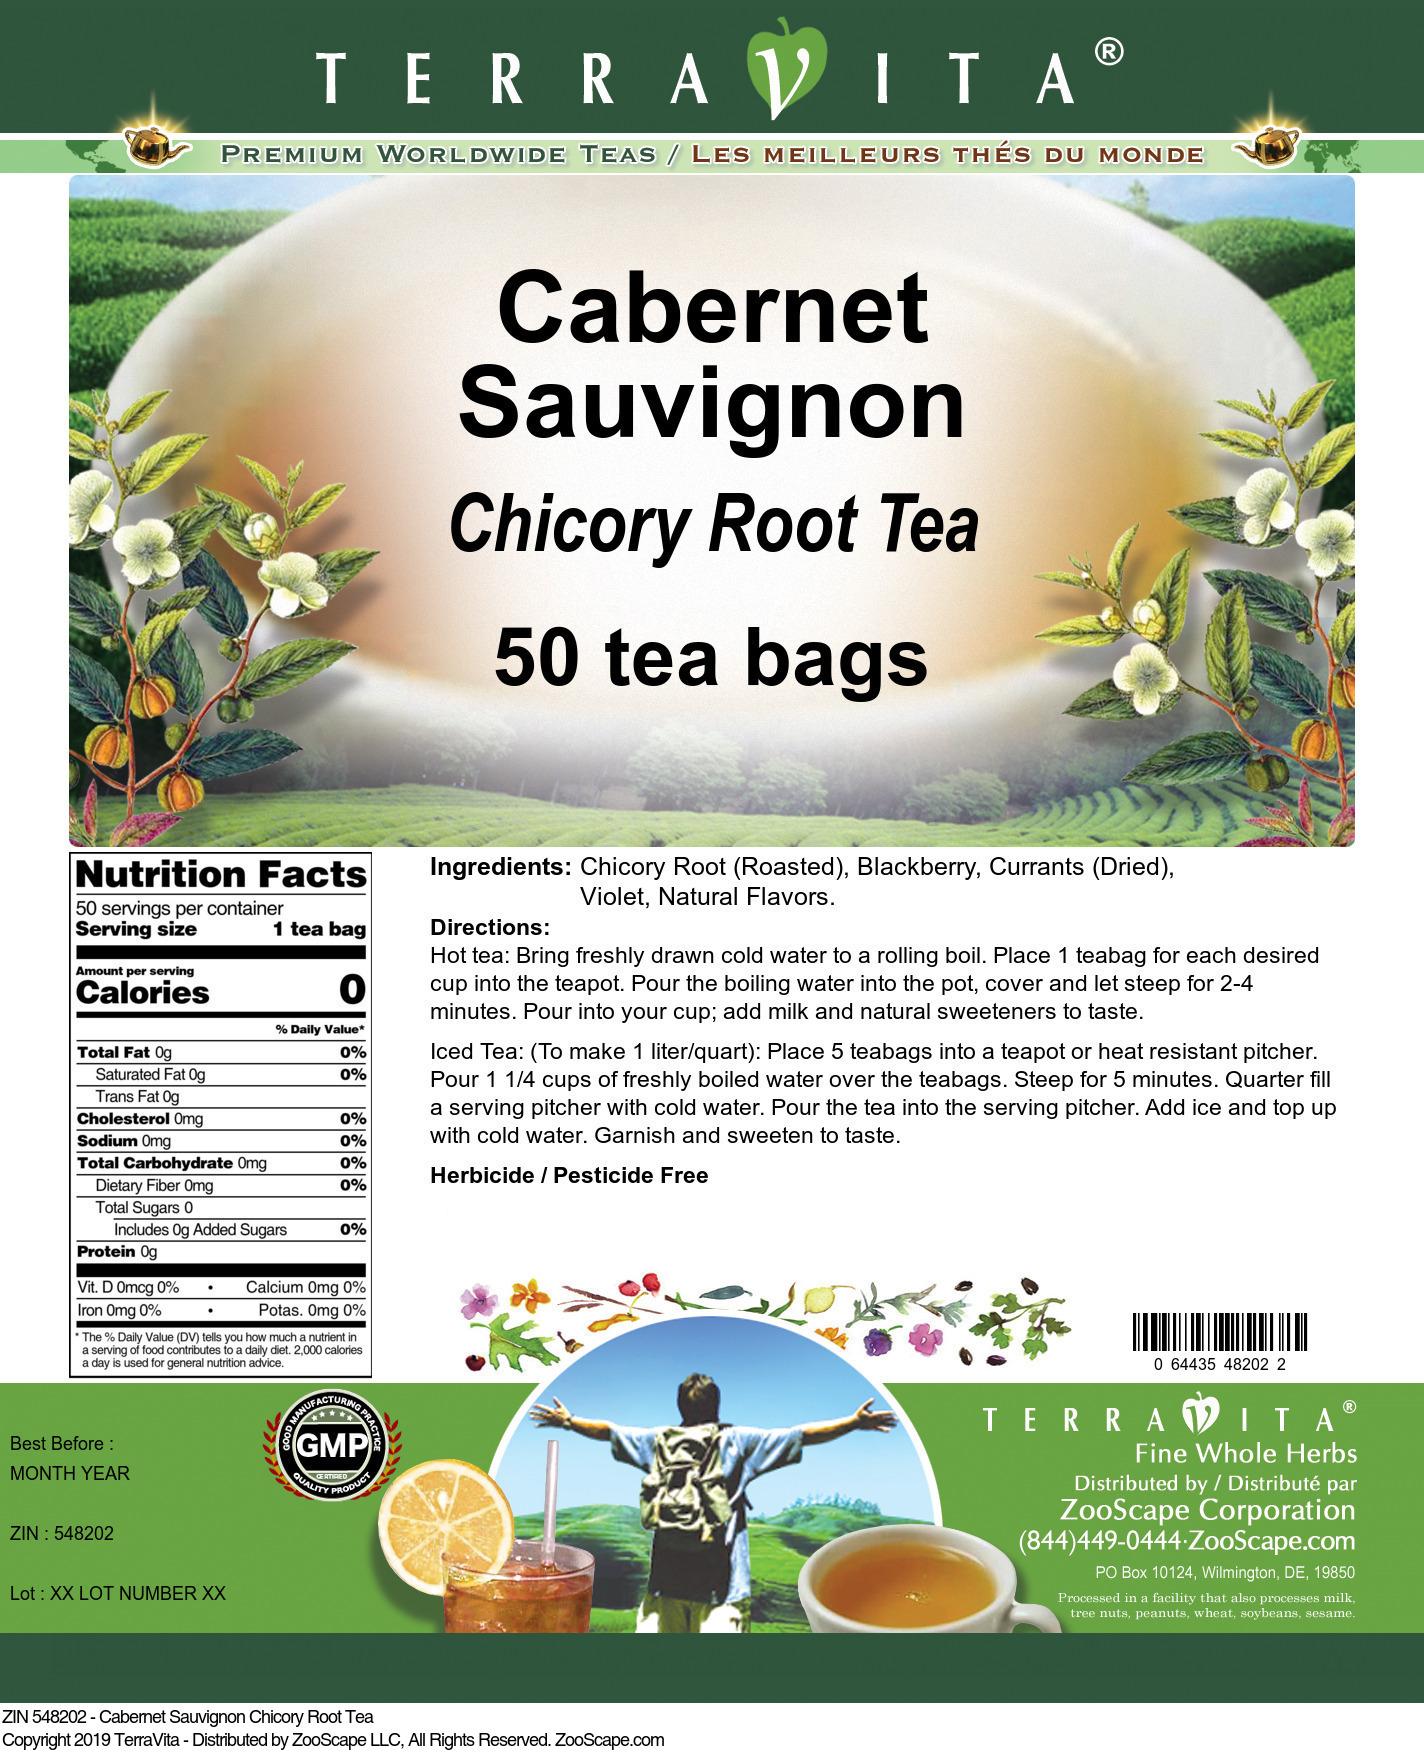 Cabernet Sauvignon Chicory Root